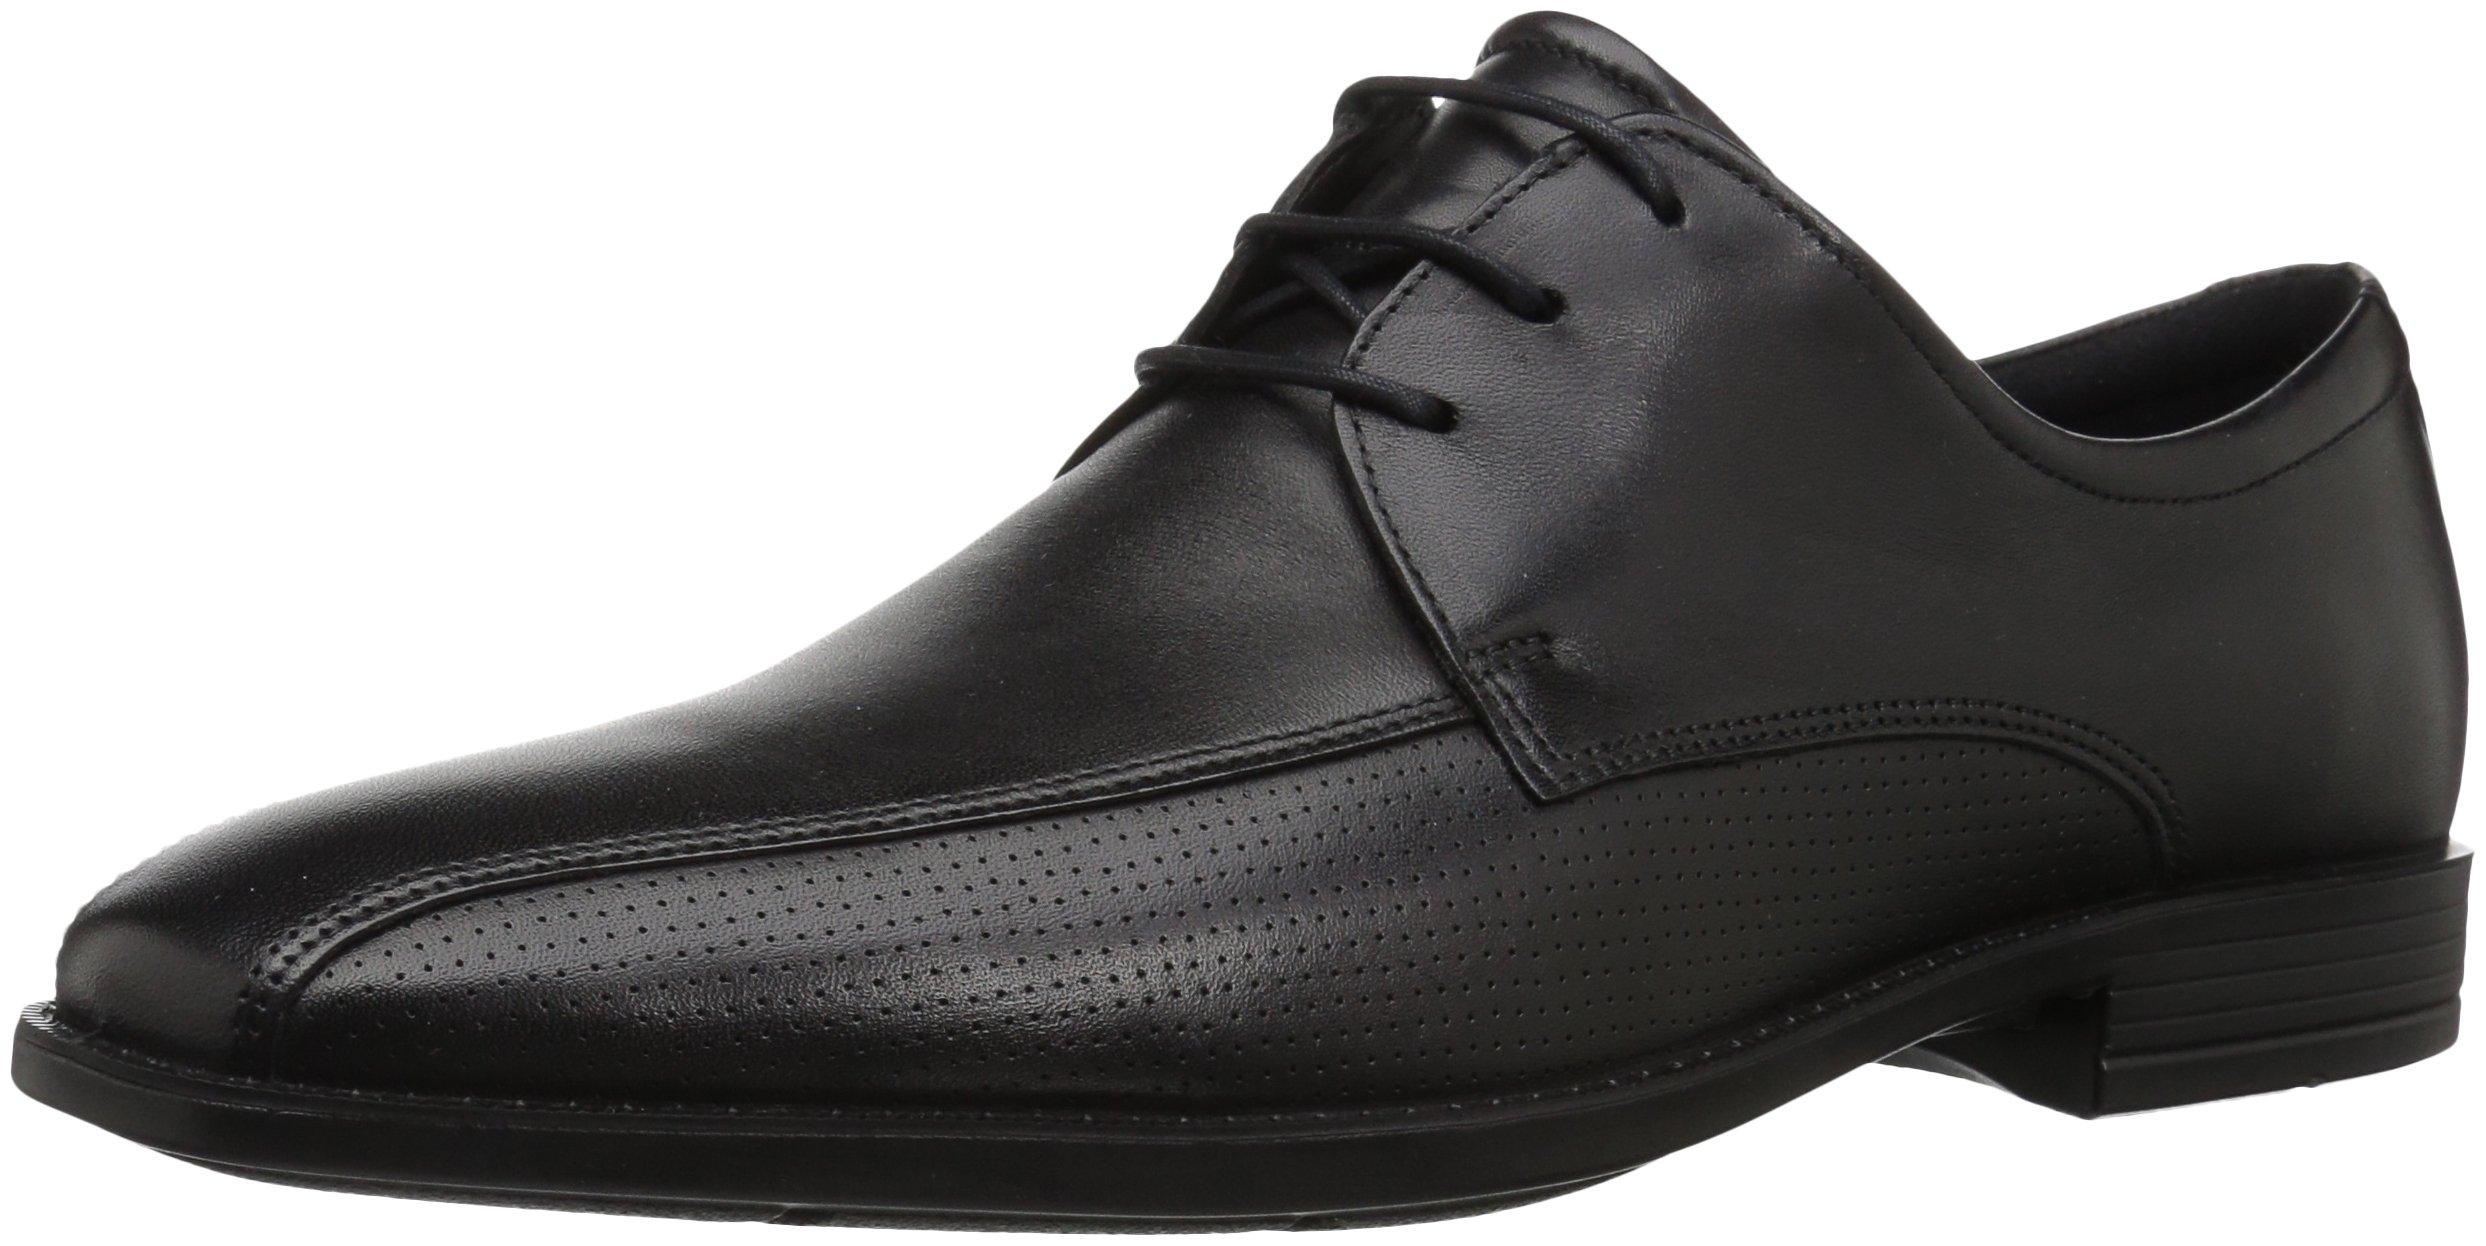 ECCO Men's Edinburgh Perforated Tie Oxford, Black/Black Perforated, 39 EU/5-5.5 M US